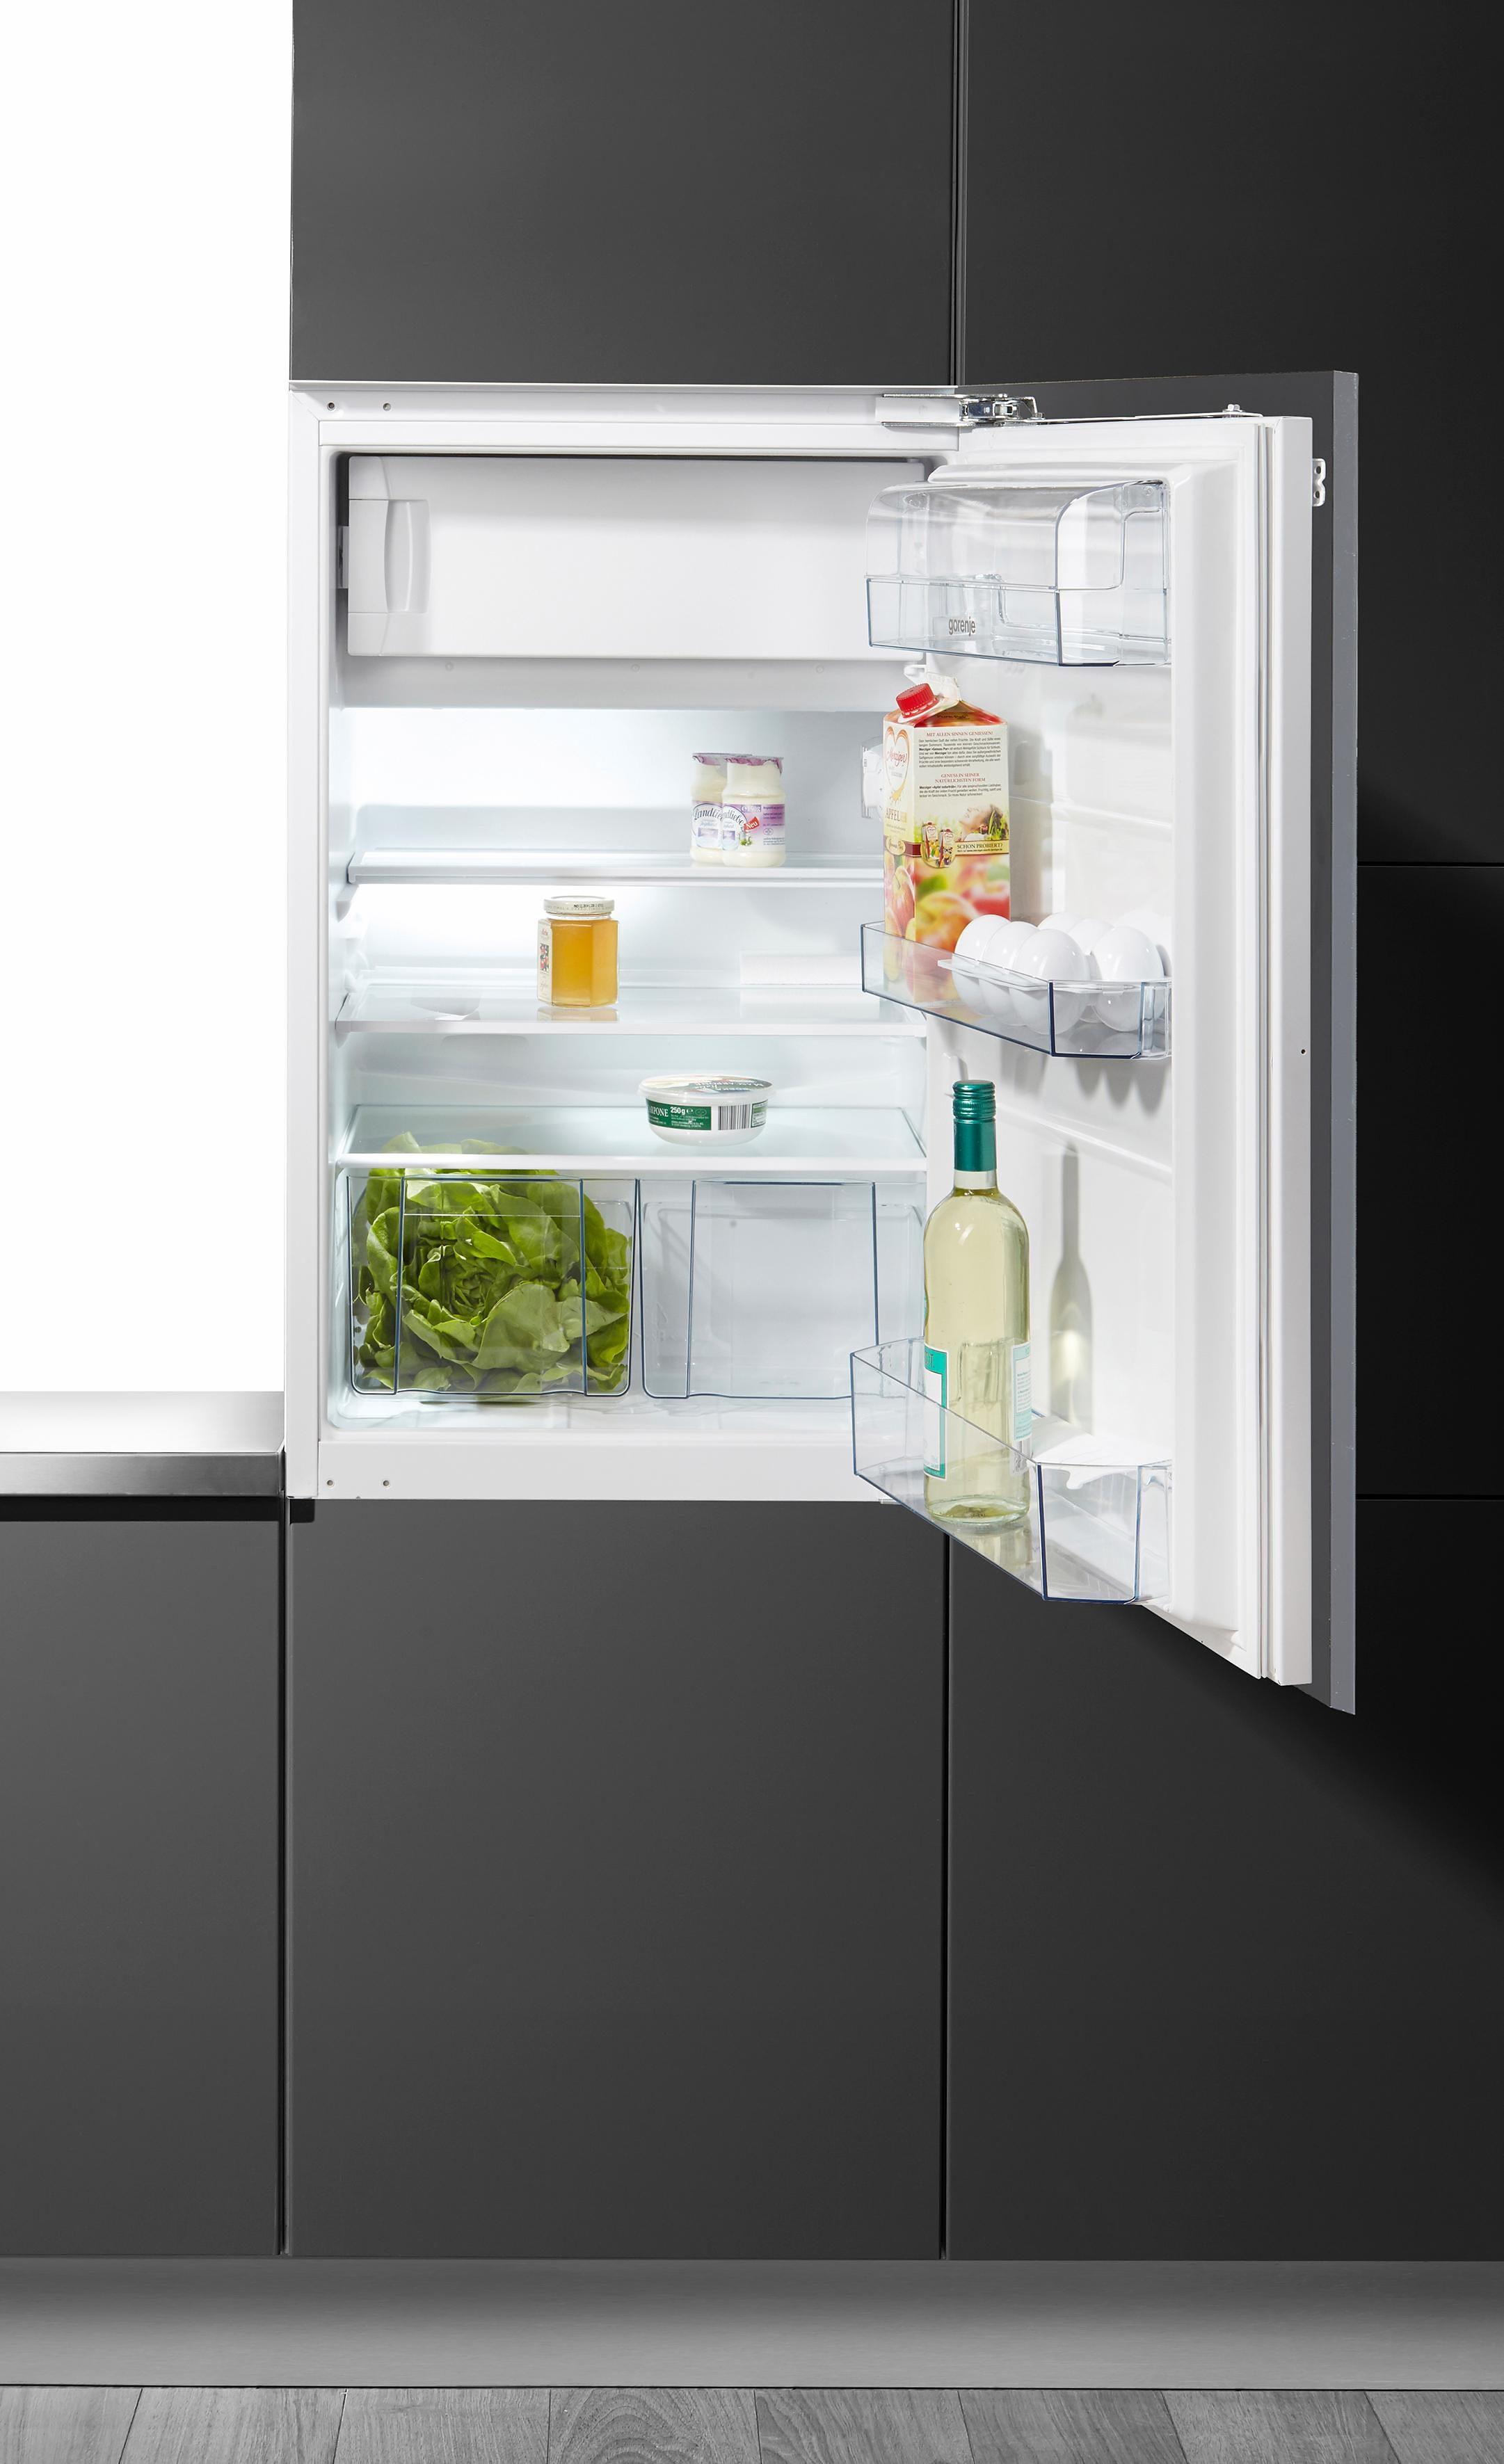 Gorenje integrierfähiger Einbaukühlschrank RBI 5092 AW, A++, 87,5 cm